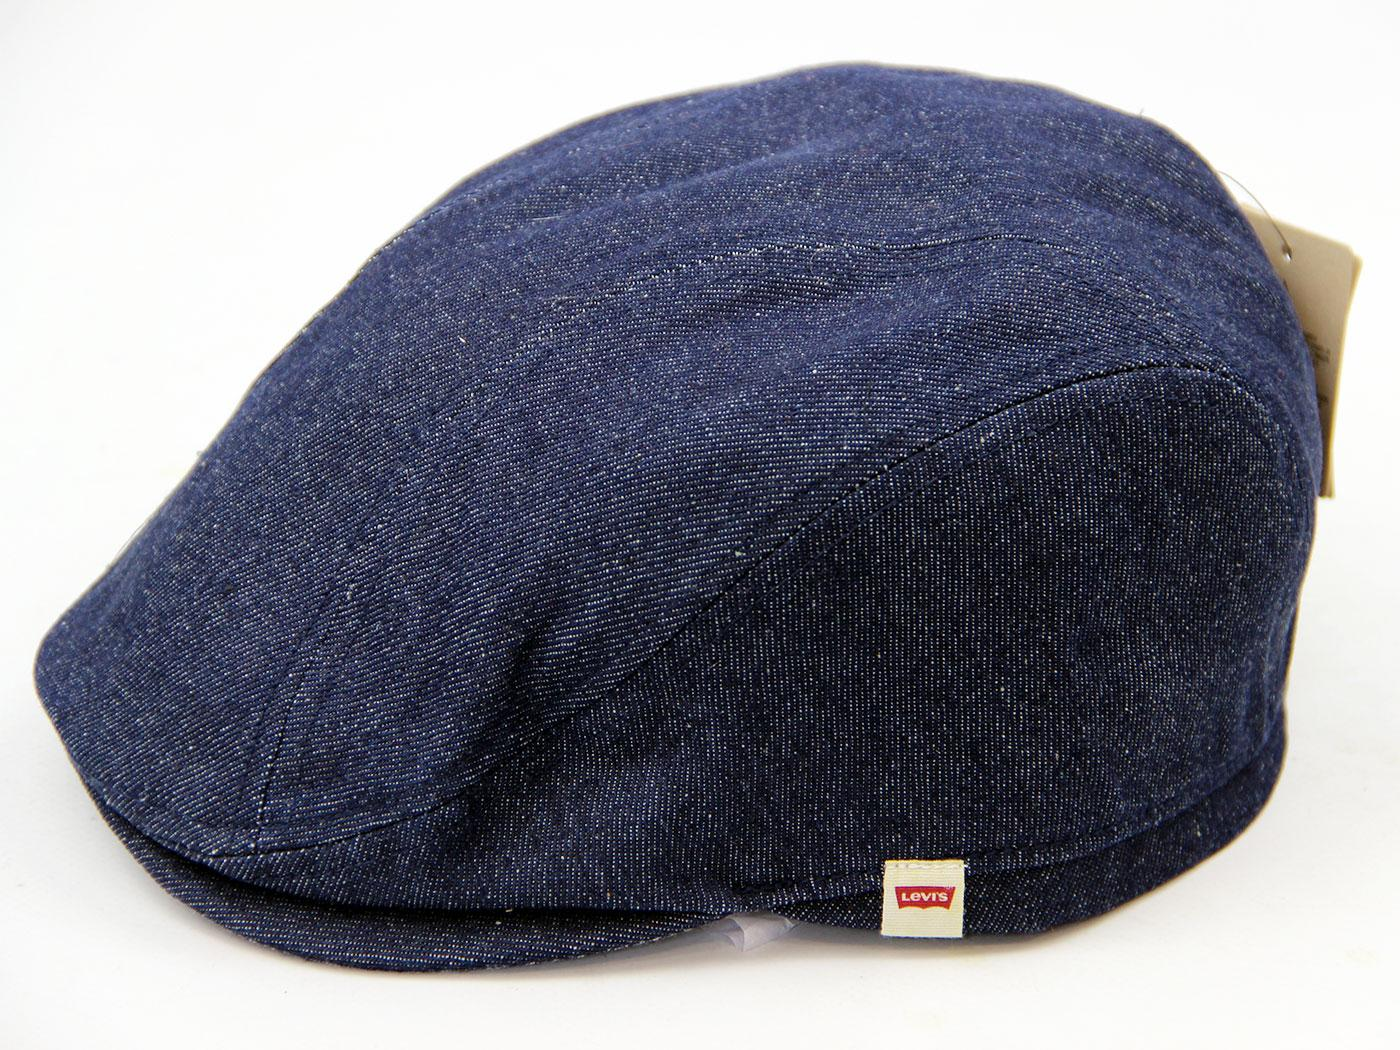 LEVI S® Retro Indie Mod Dark Blue Denim Flat Cap 31de02a6372